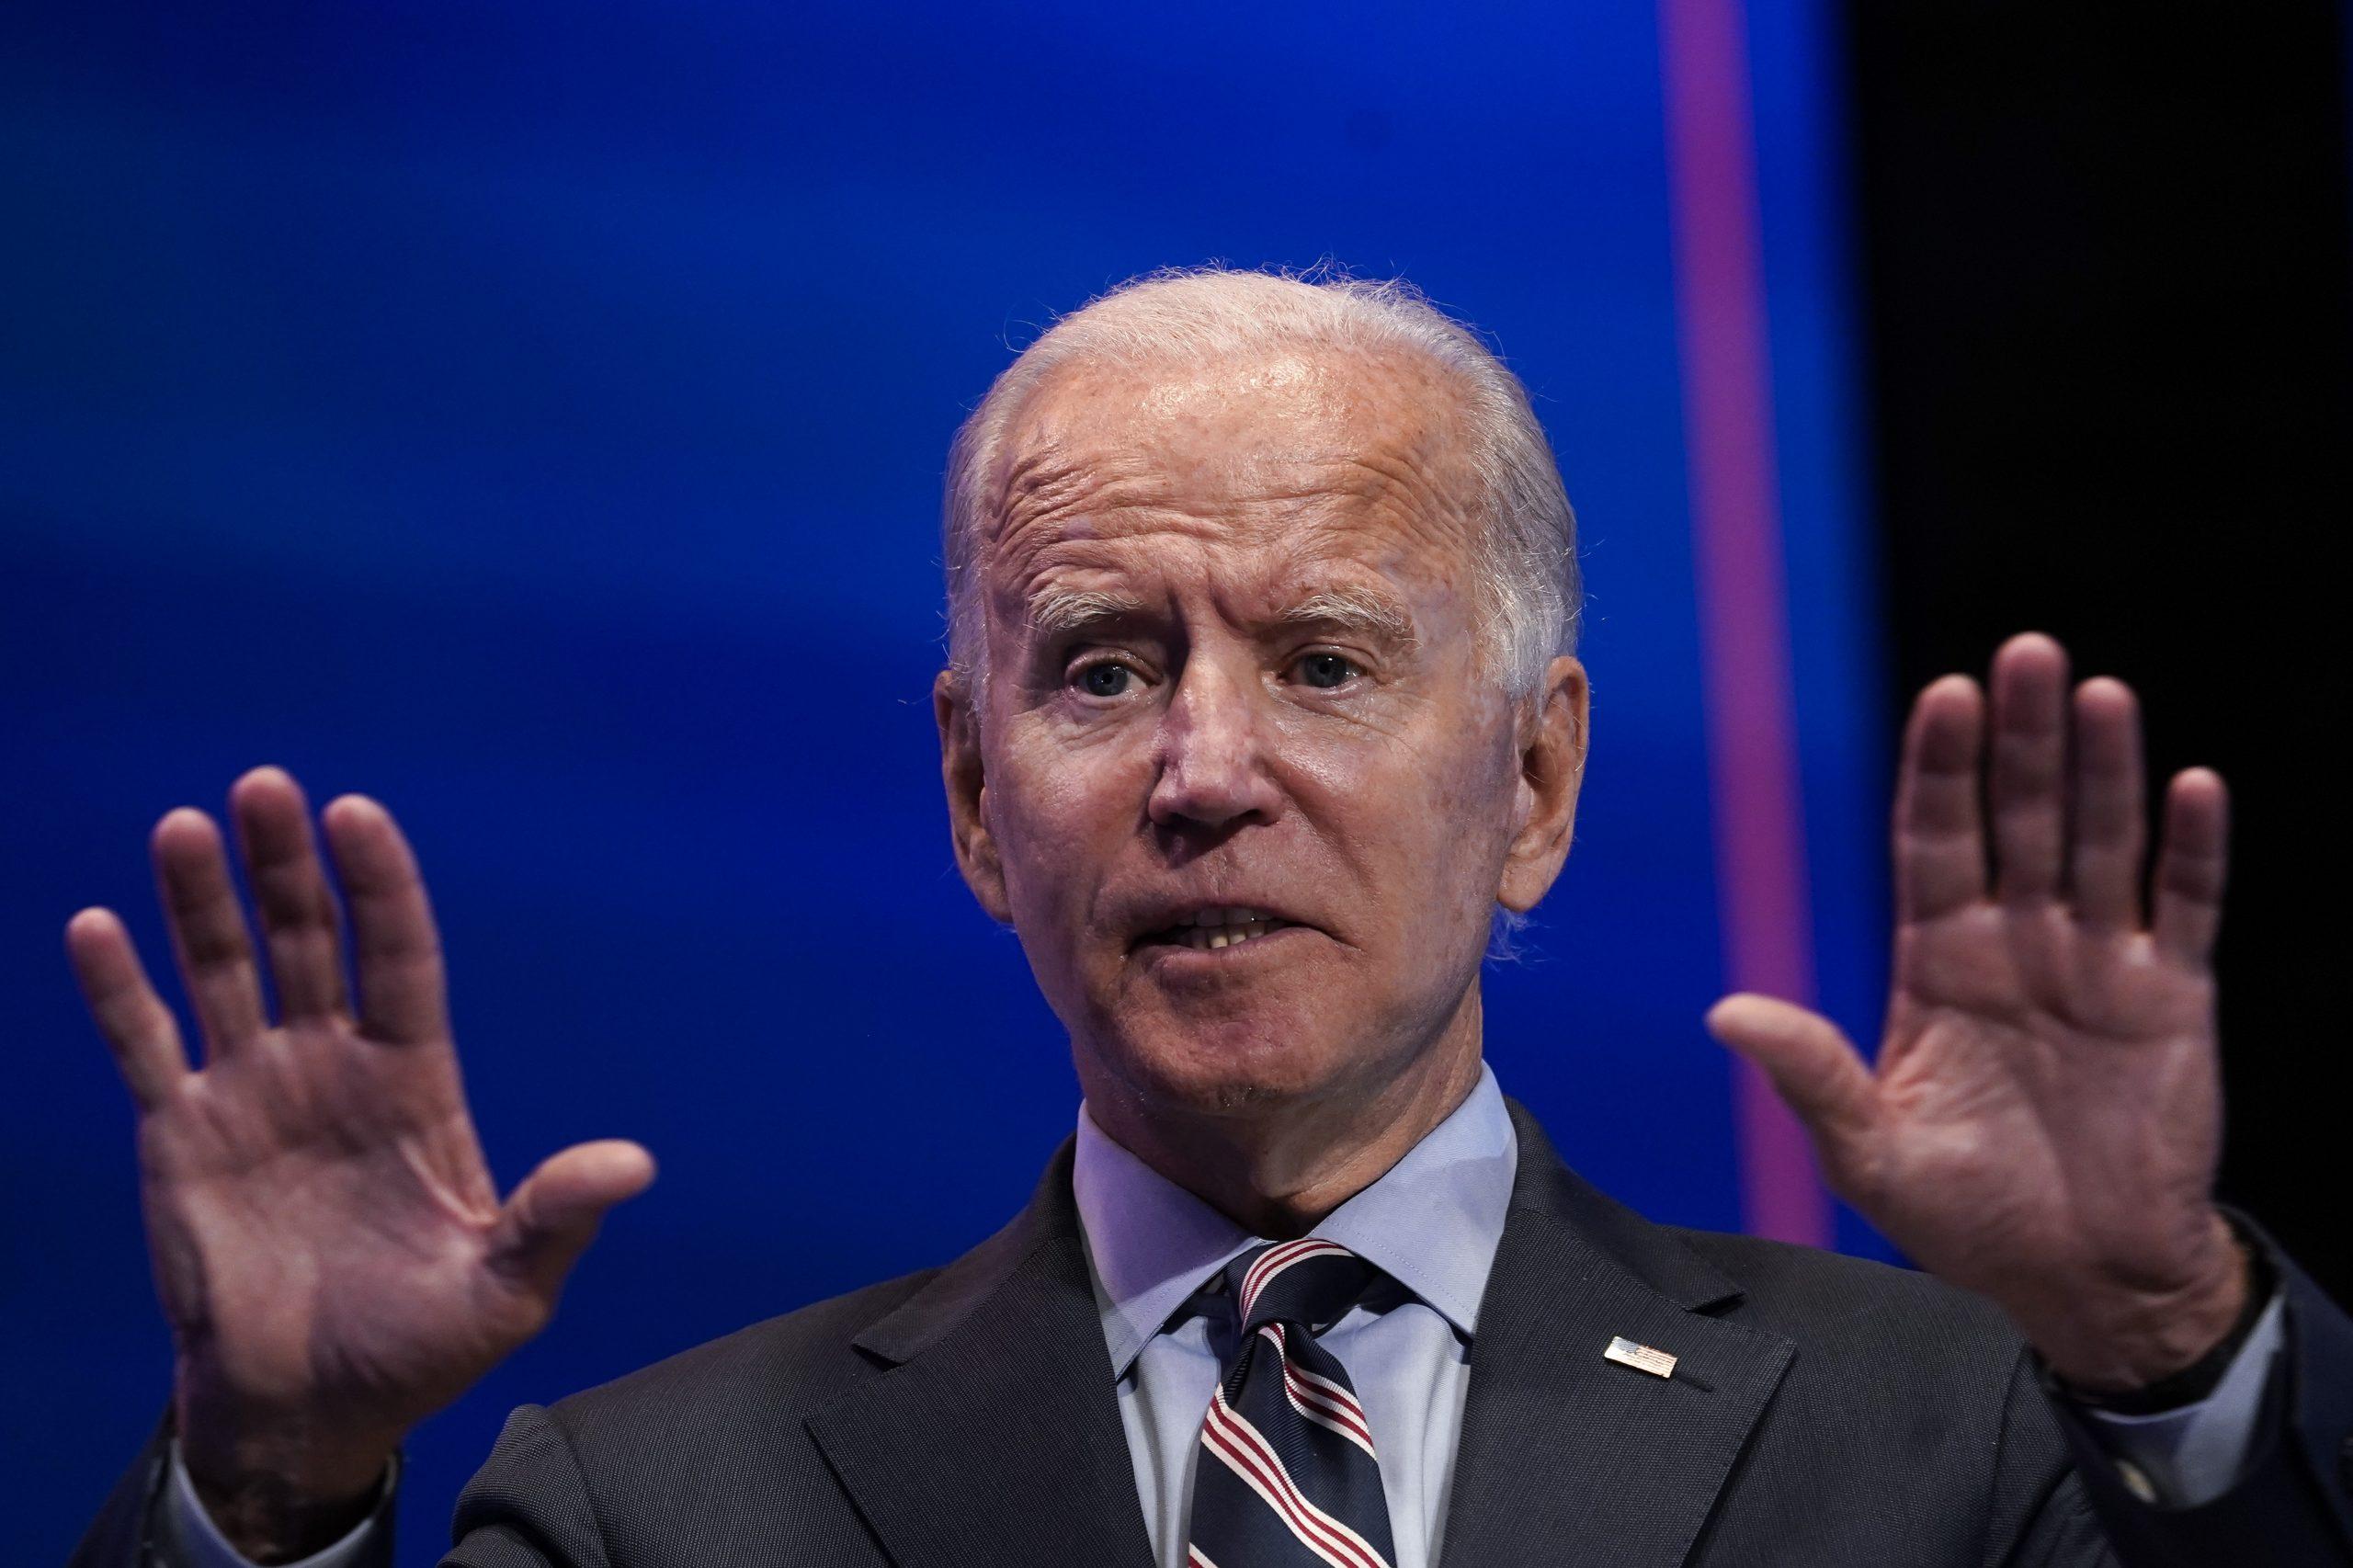 Joe Biden (Photo by Drew Angerer/Getty Images)